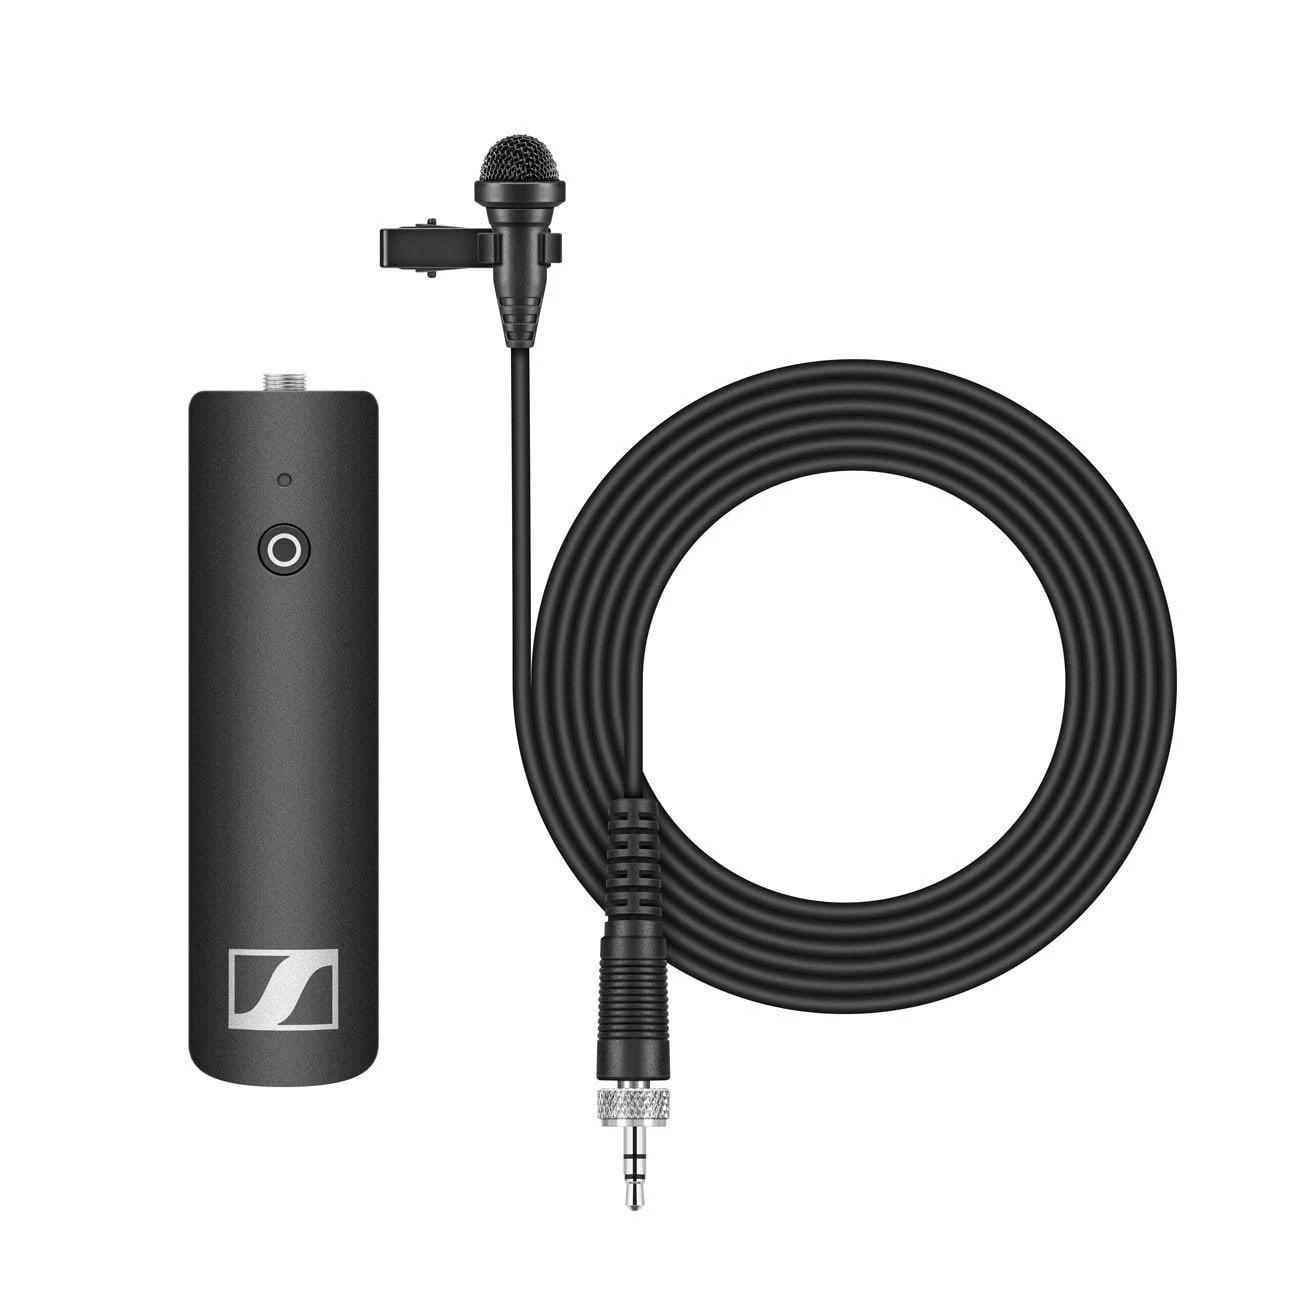 Sennheiser XSW-D Lavalier Set – Wireless Microphone System 3